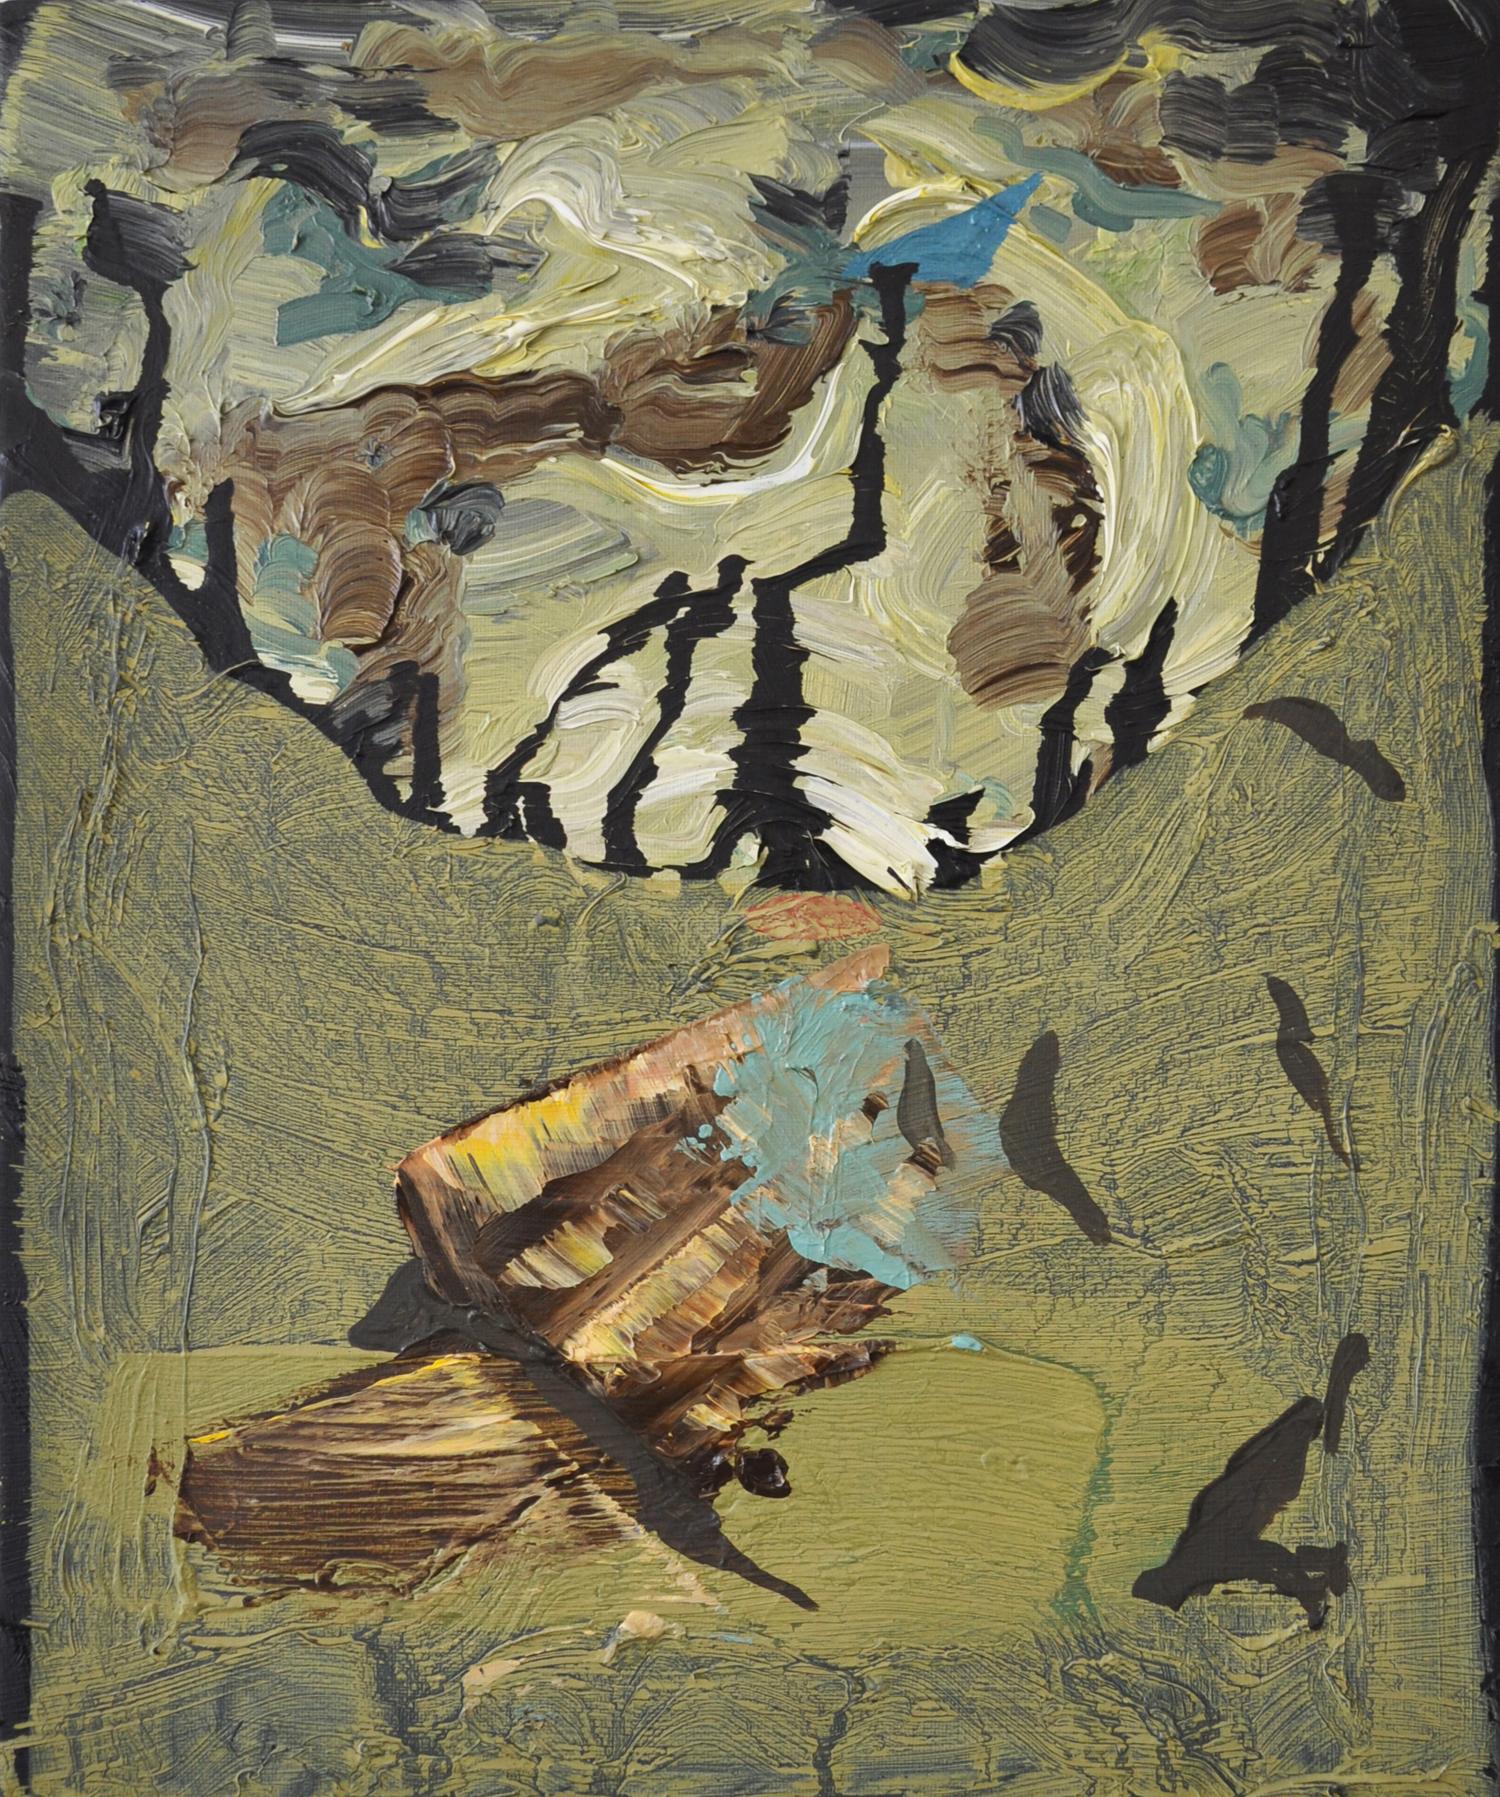 Fragment, 2013, Oil on canvas, 30 x 25 cm